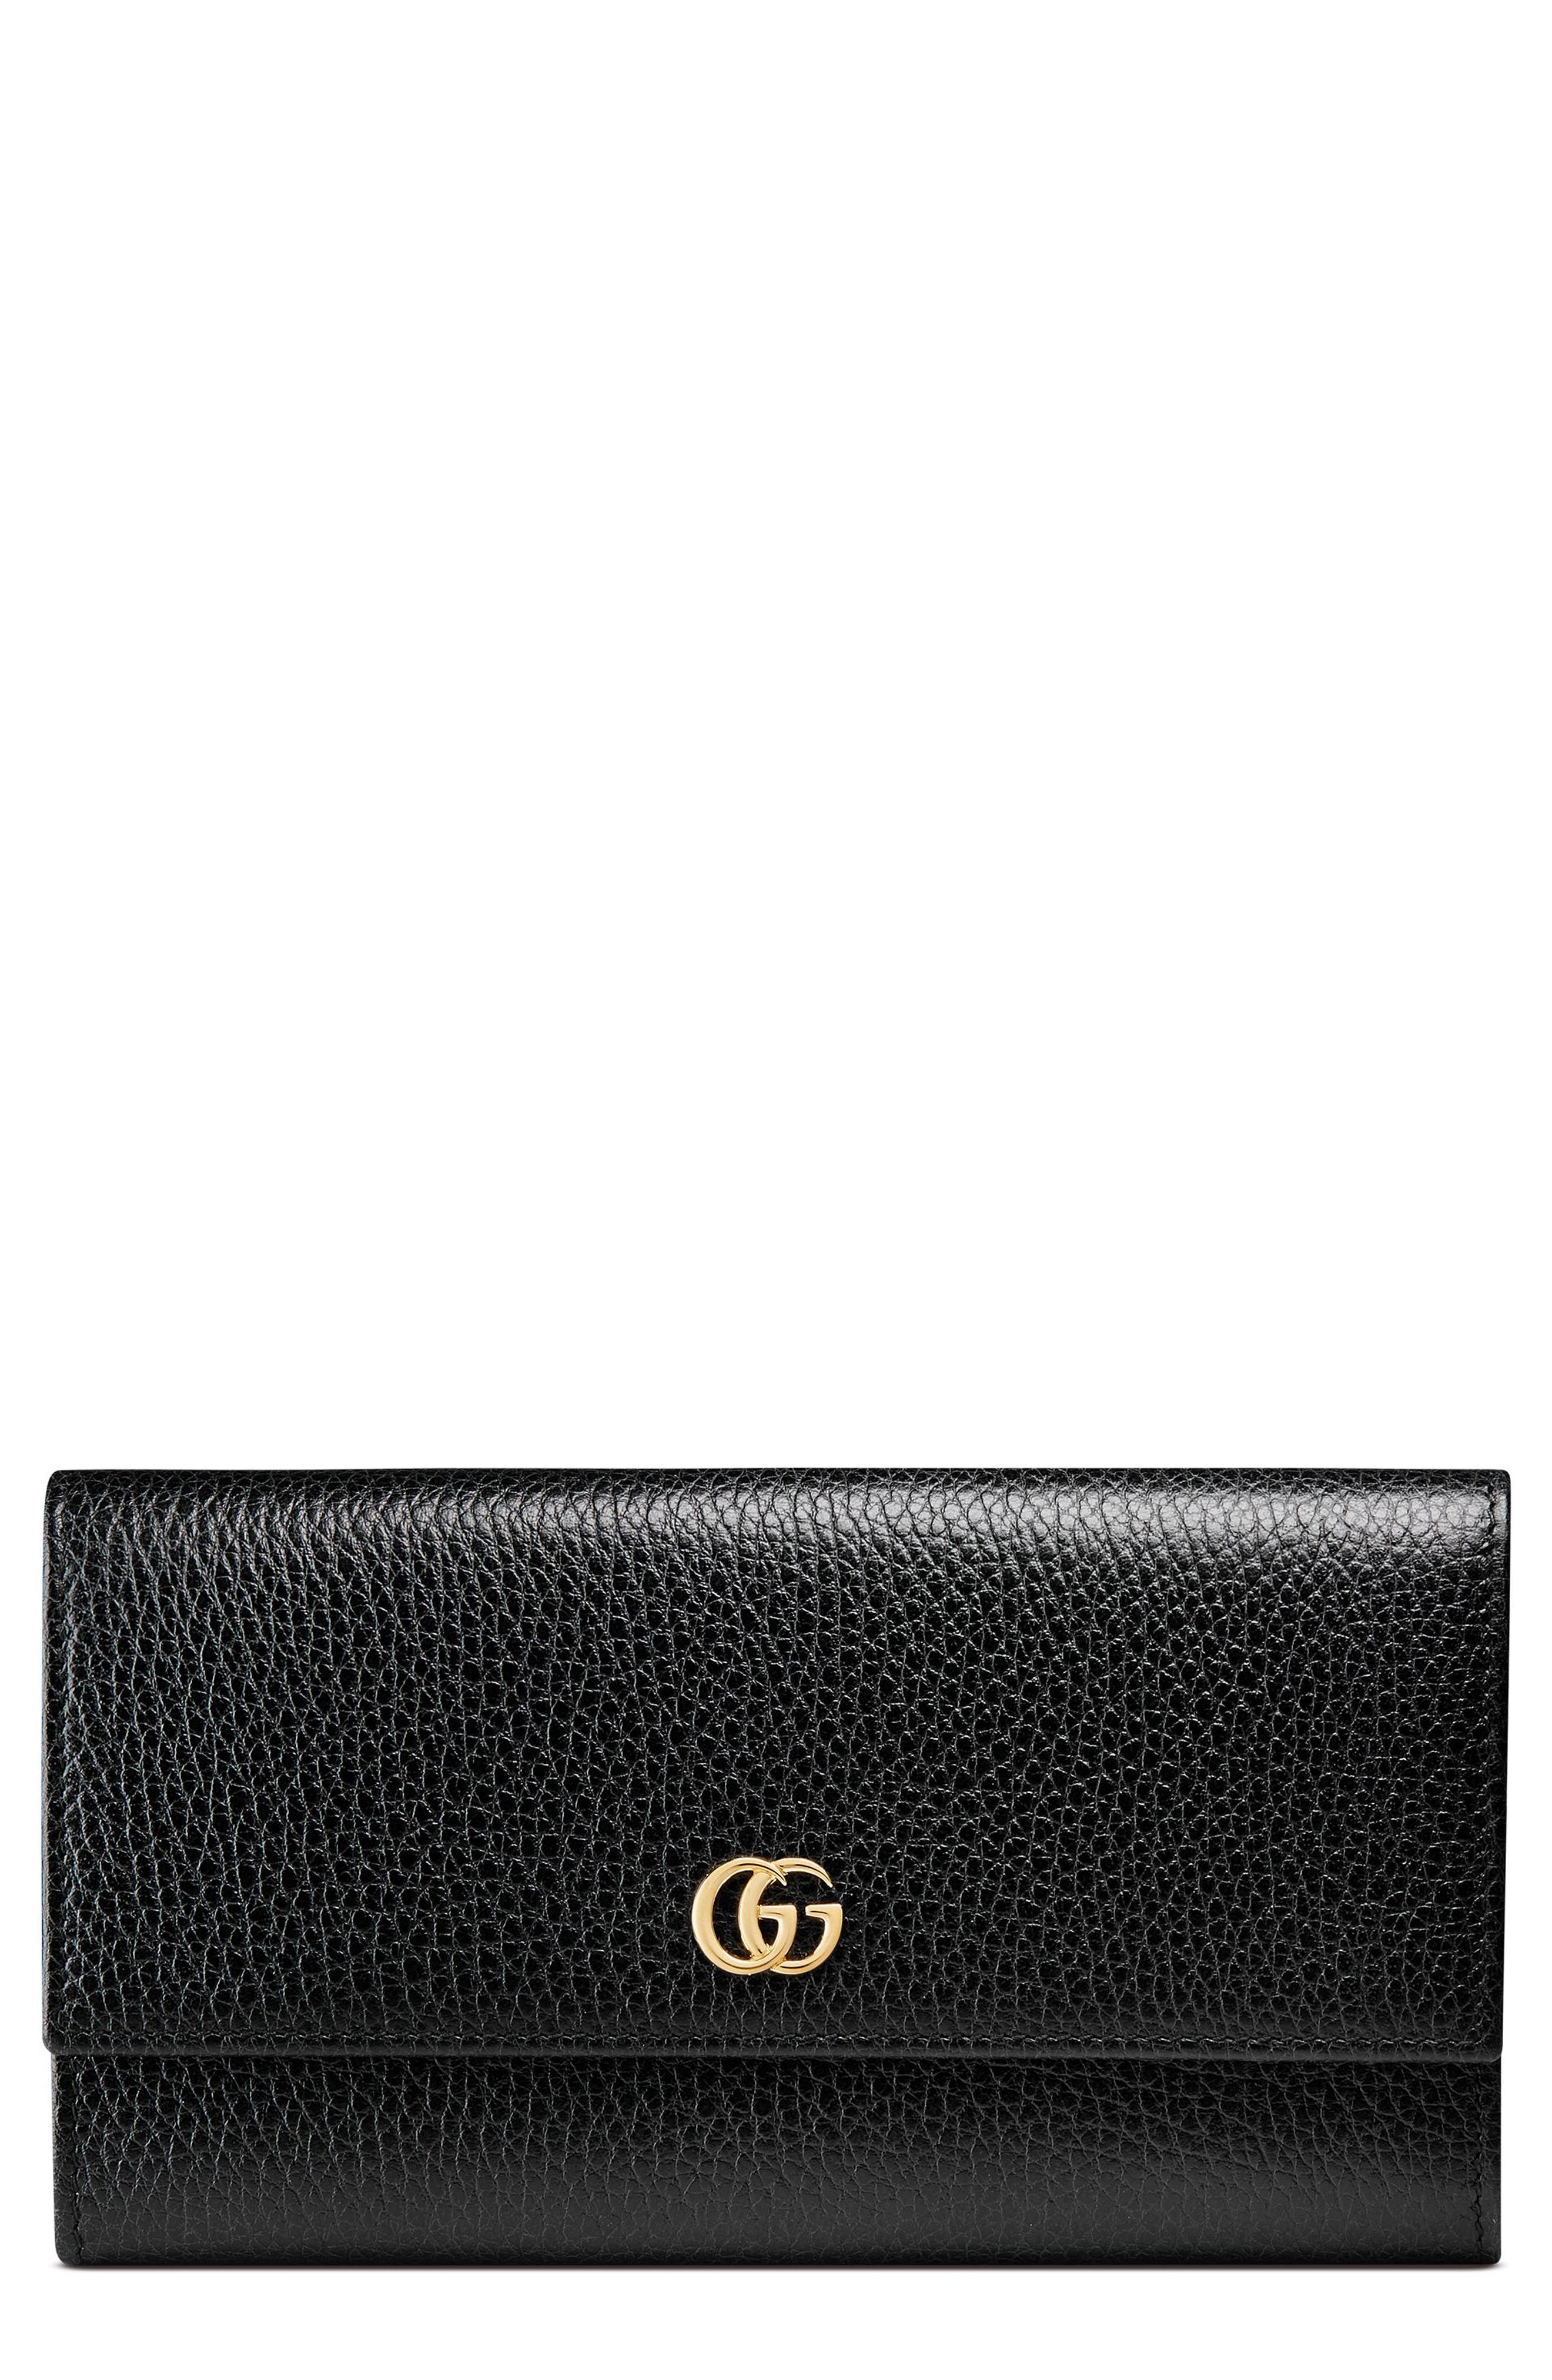 Petite Marmont Leather Continental Wallet,                         Main,                         color, NERO/ NERO